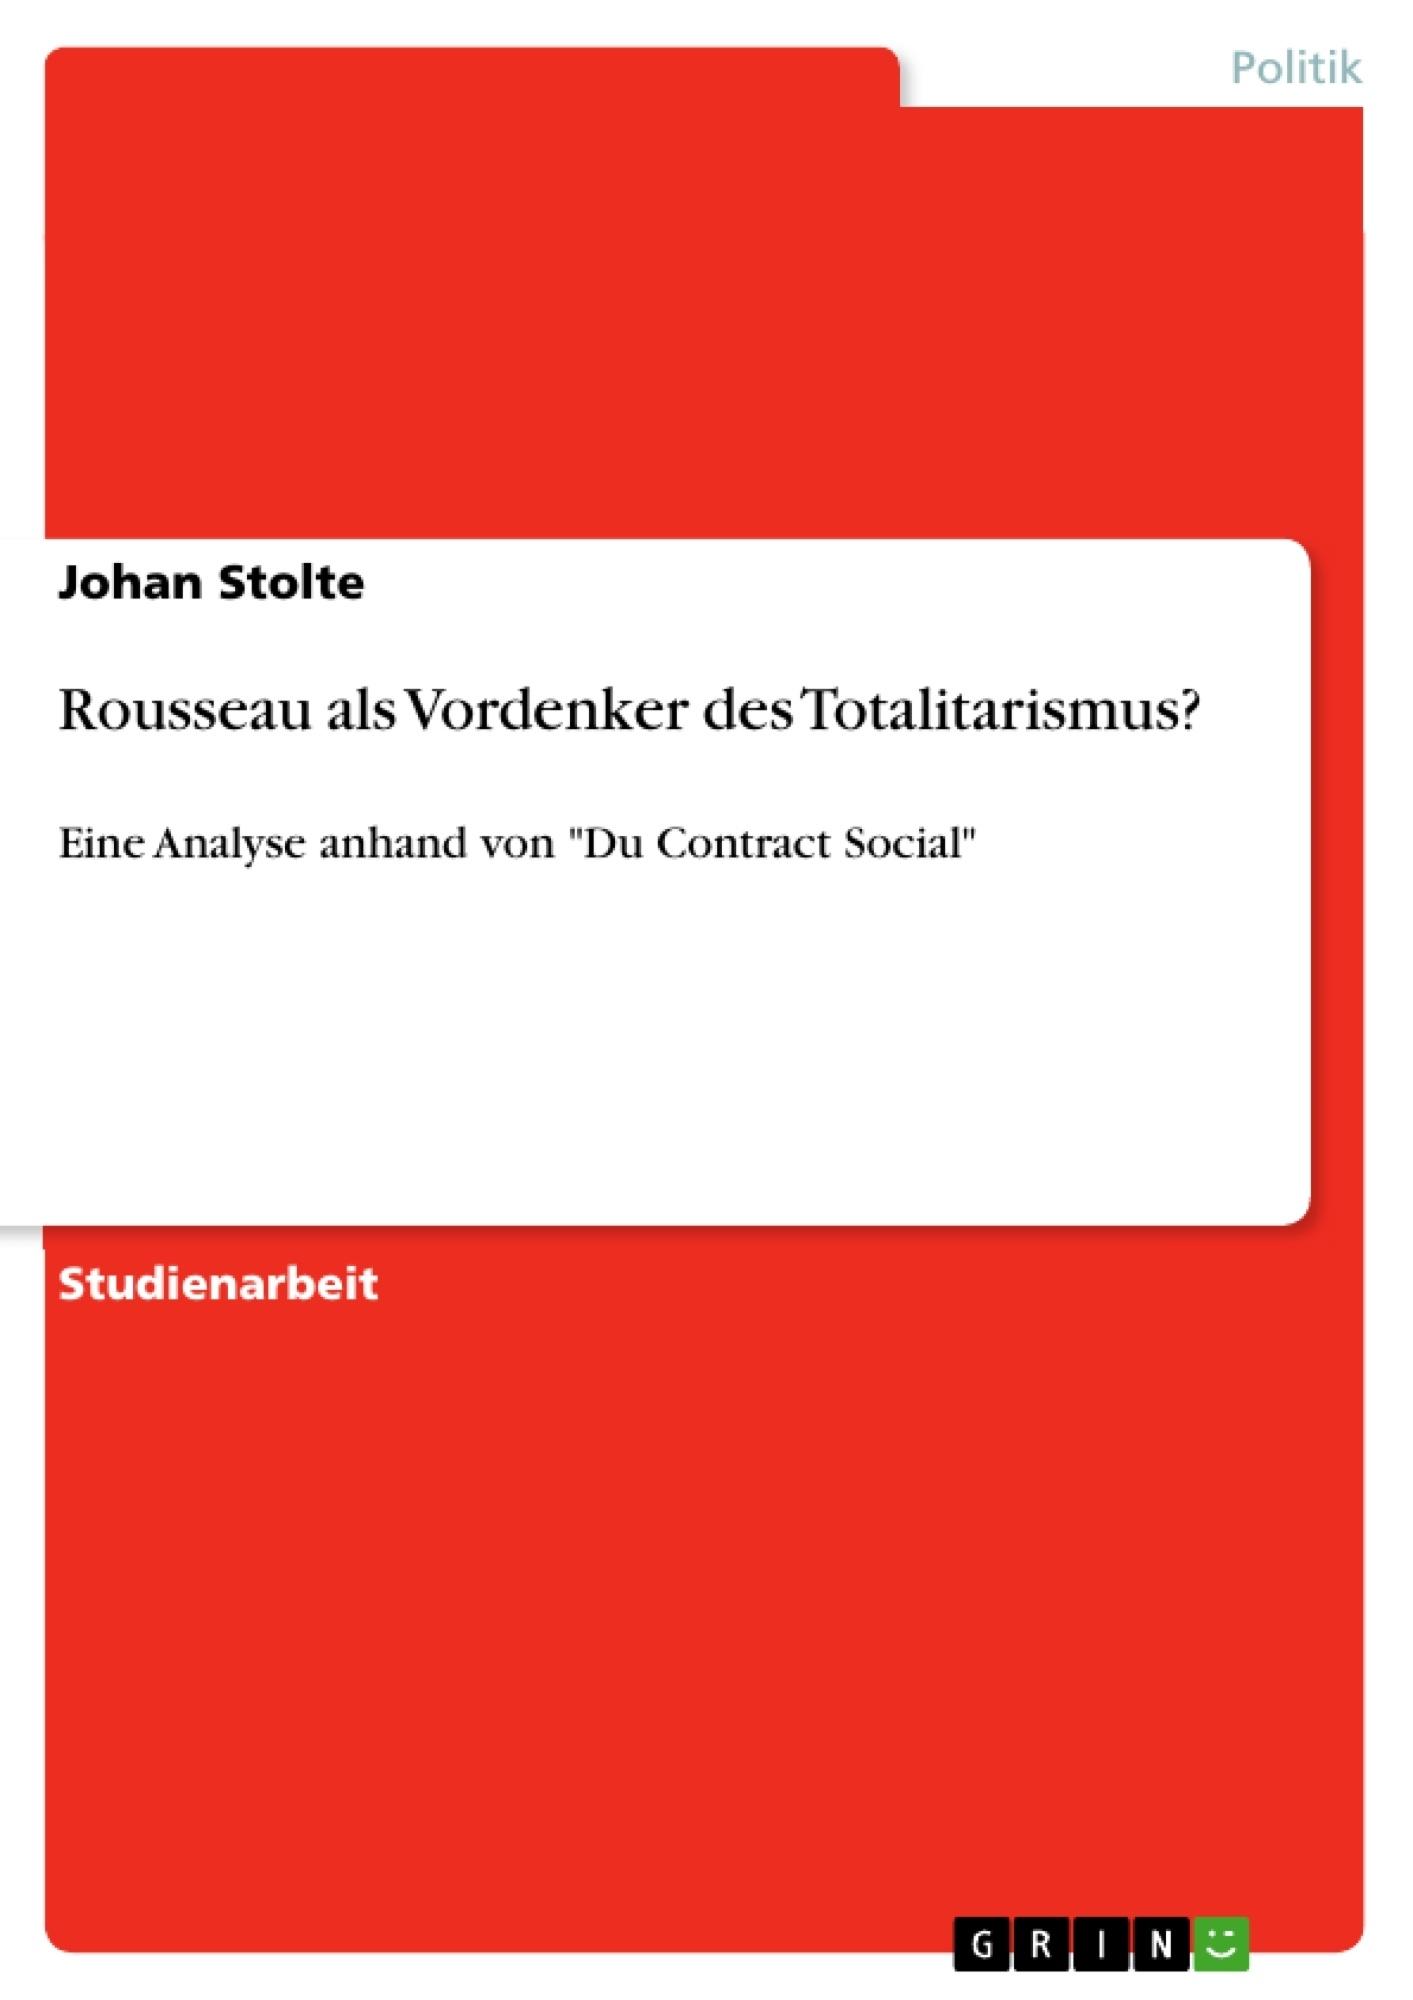 Titel: Rousseau als Vordenker des Totalitarismus?